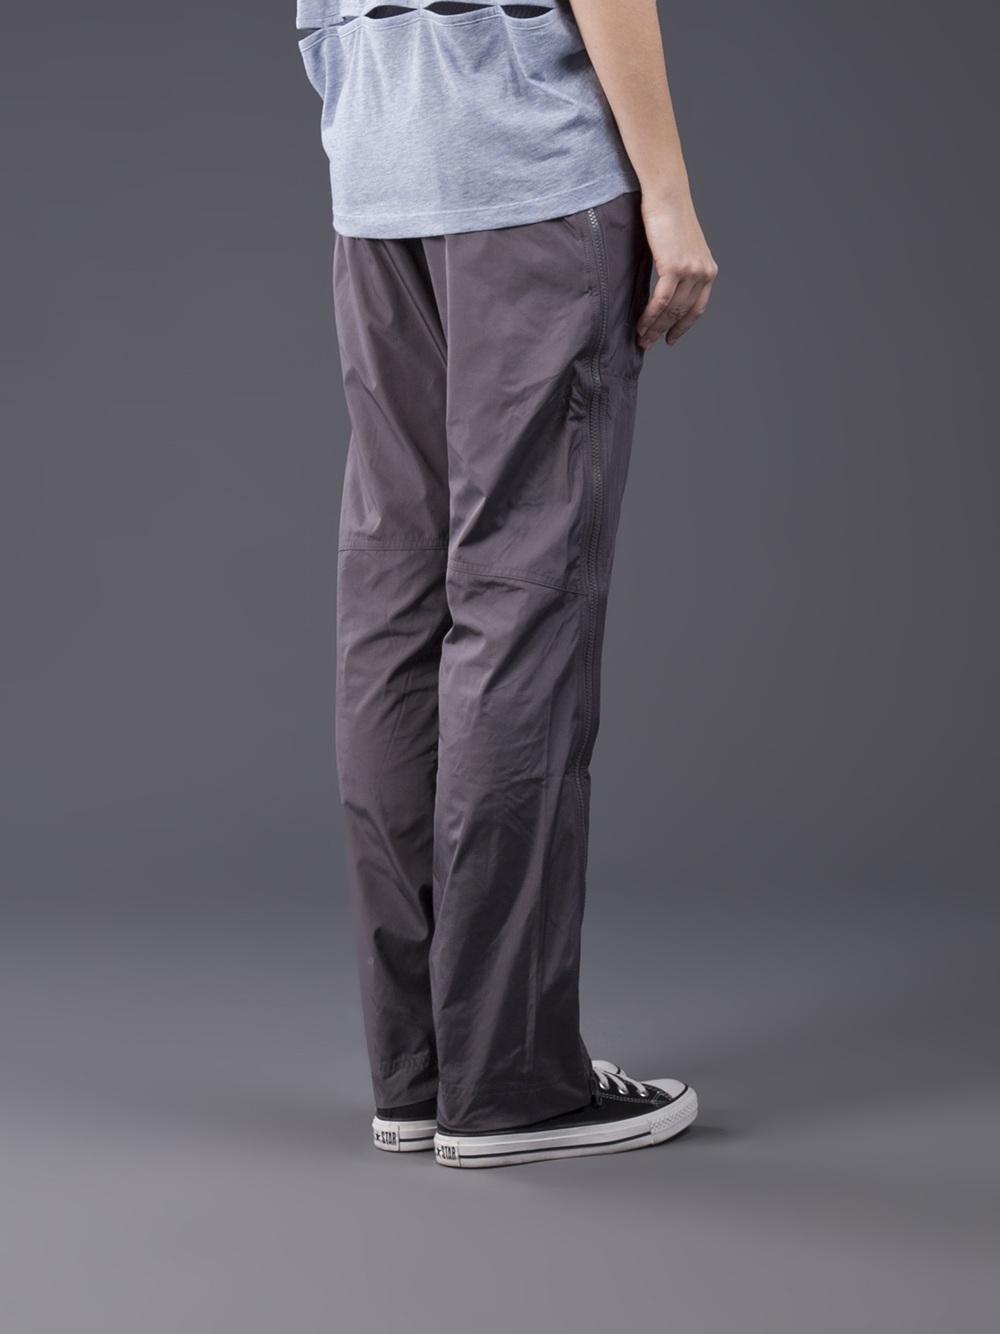 Adidas Stella McCartney Pants Studio Woven in Charcoal Gray Back View